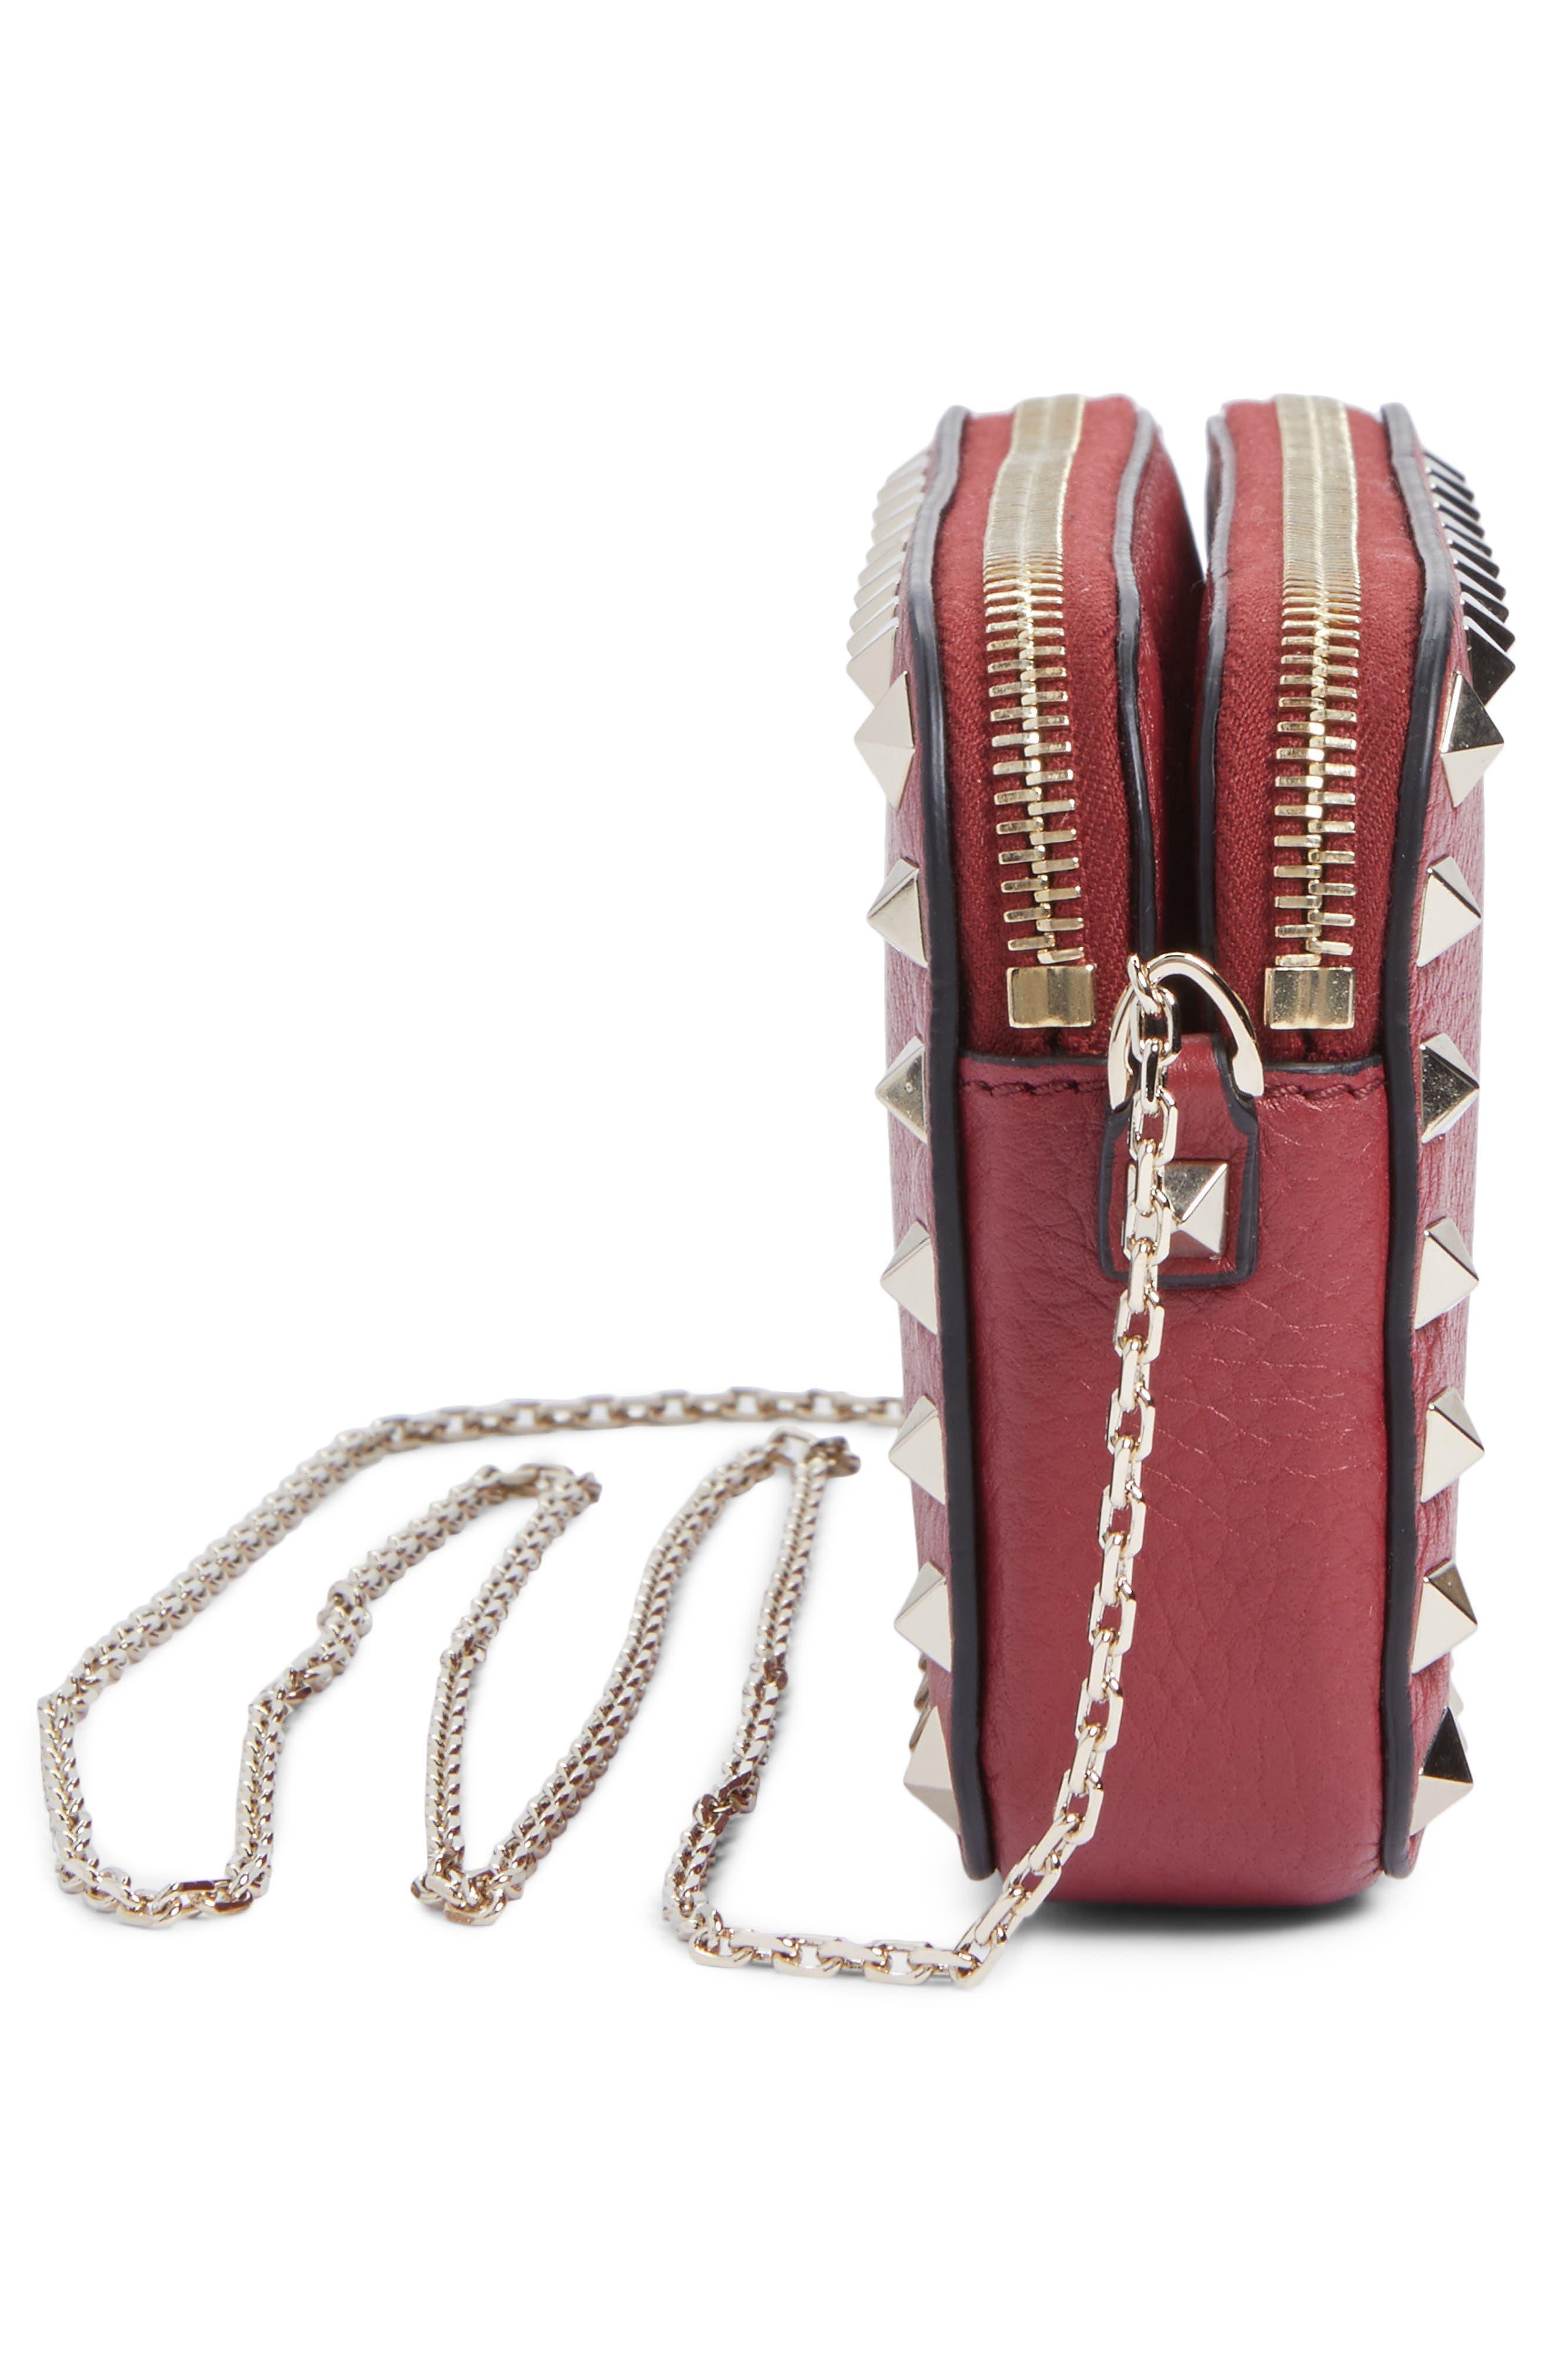 VALENTINO GARAVANI, Rockstud Leather Crossbody Bag, Alternate thumbnail 5, color, RUBIN